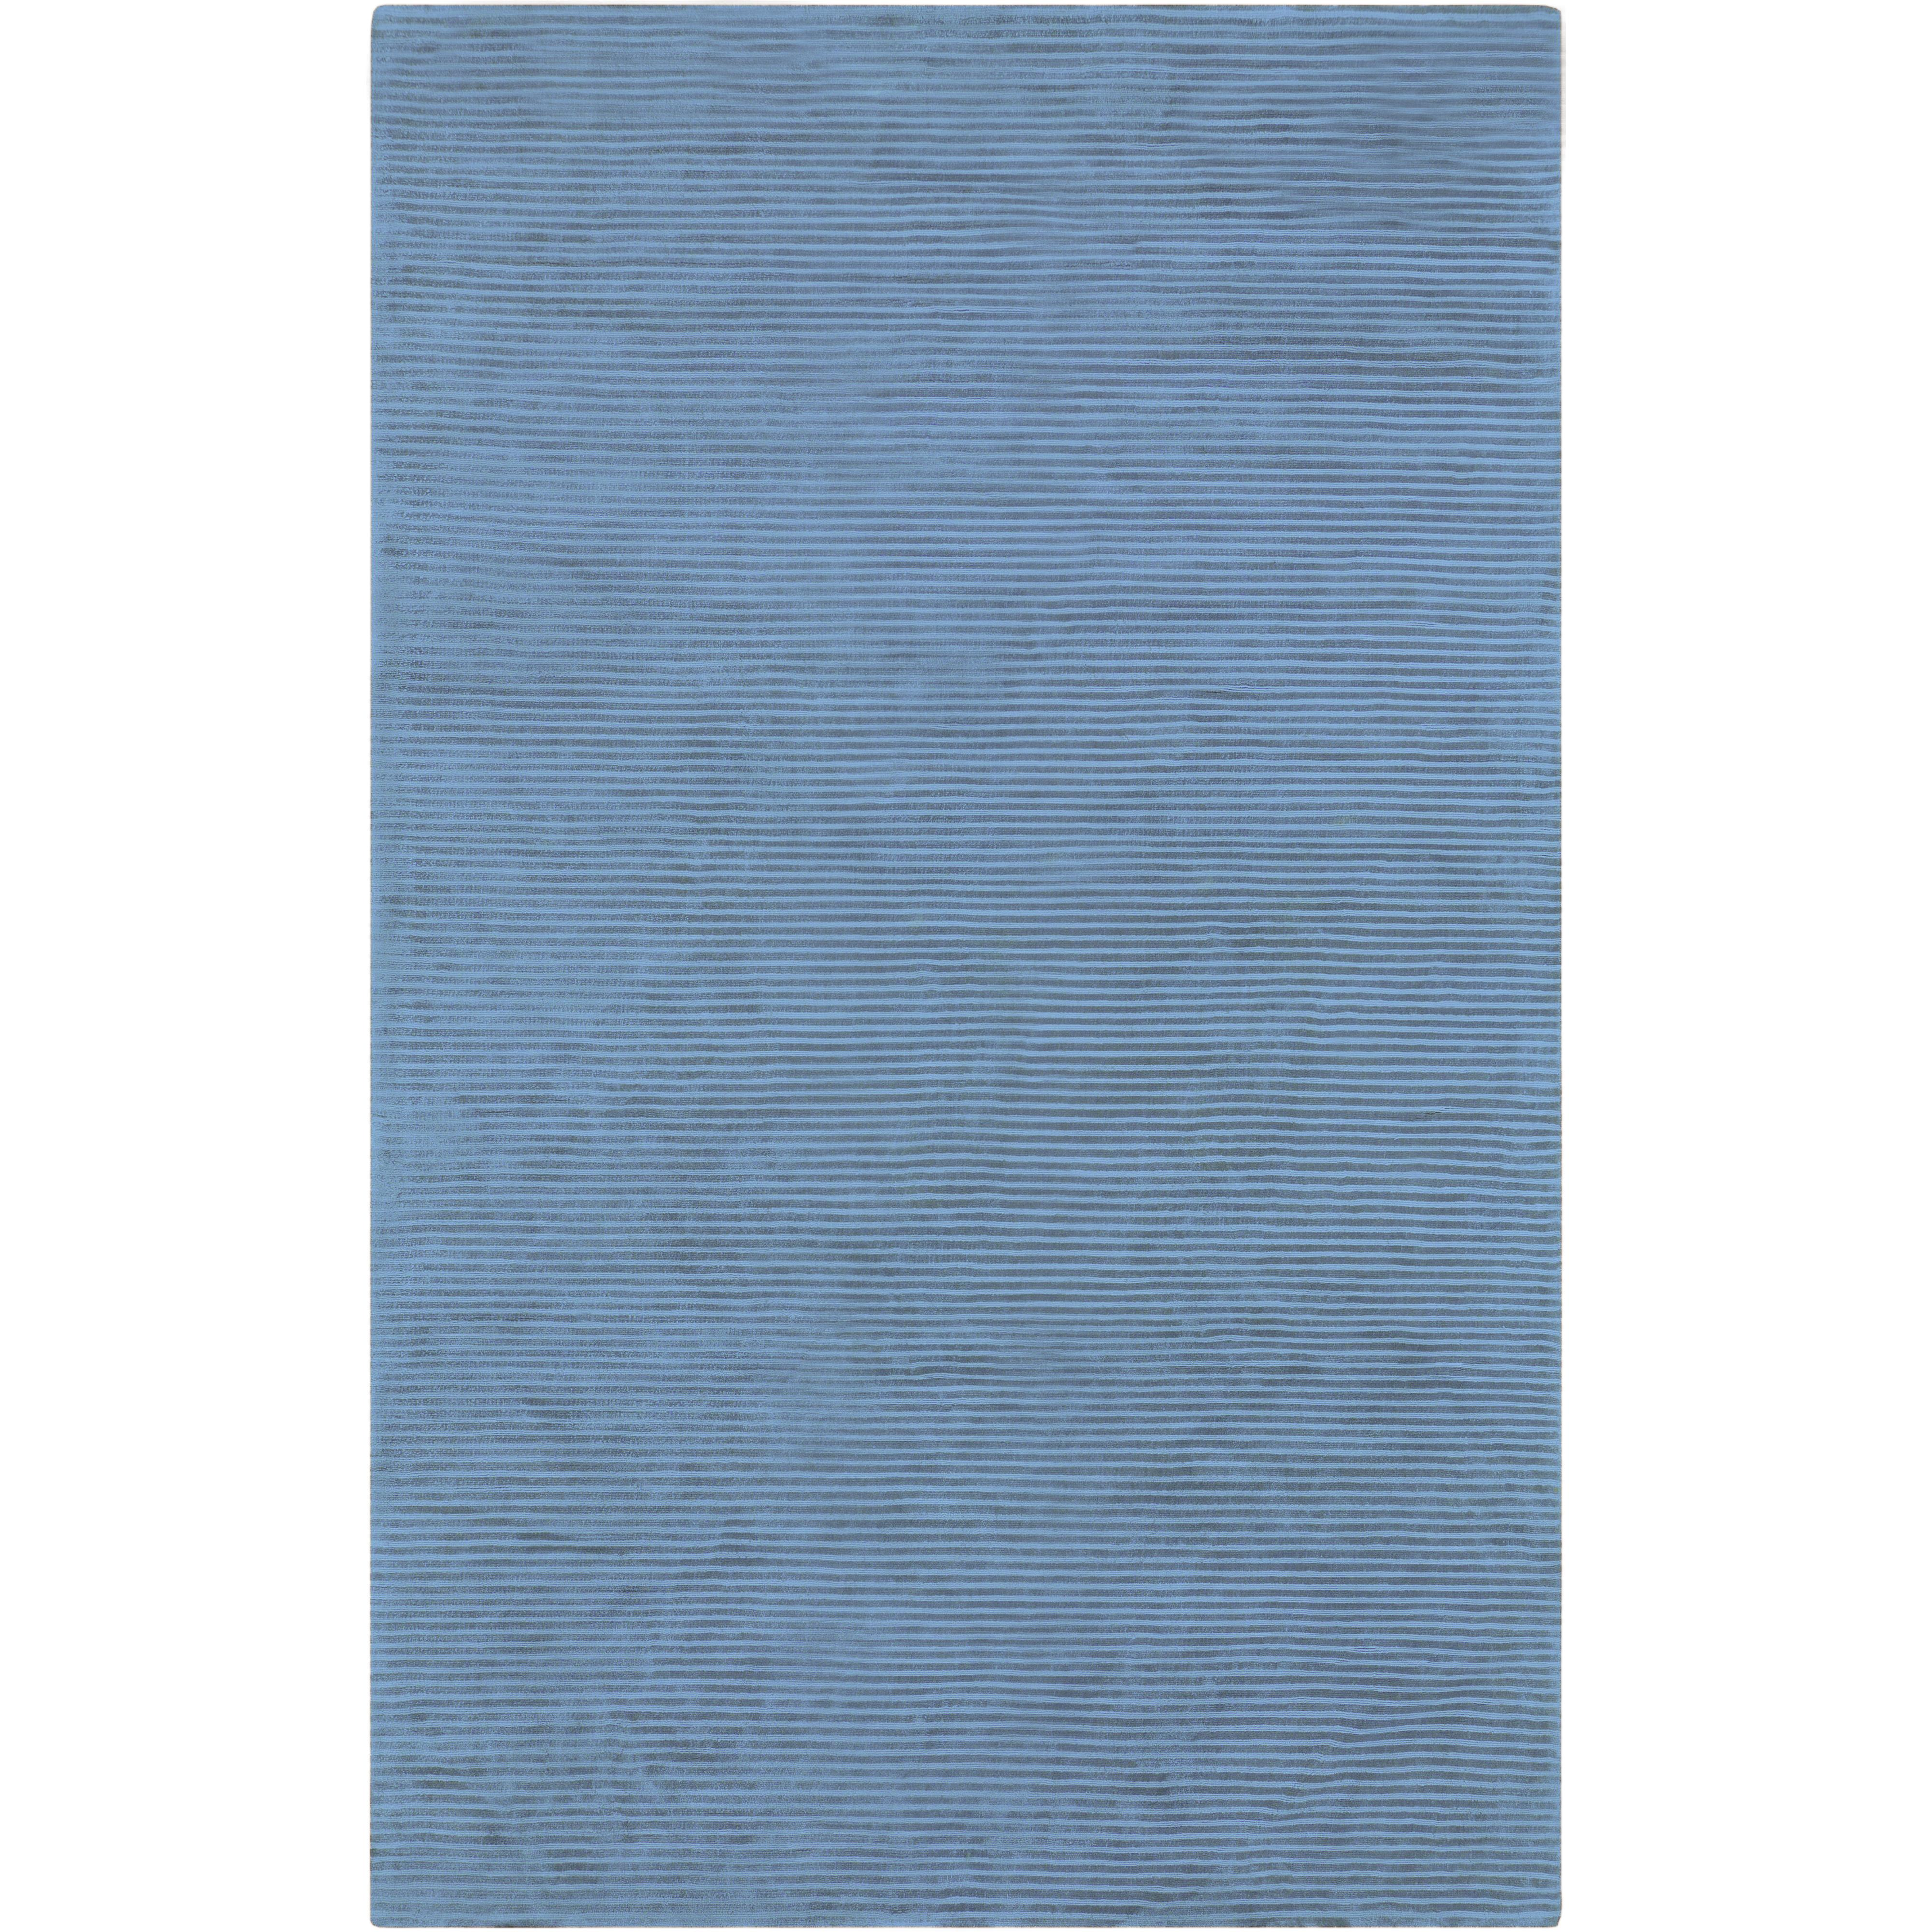 Surya Graphite 8' x 11' - Item Number: GPH54-811